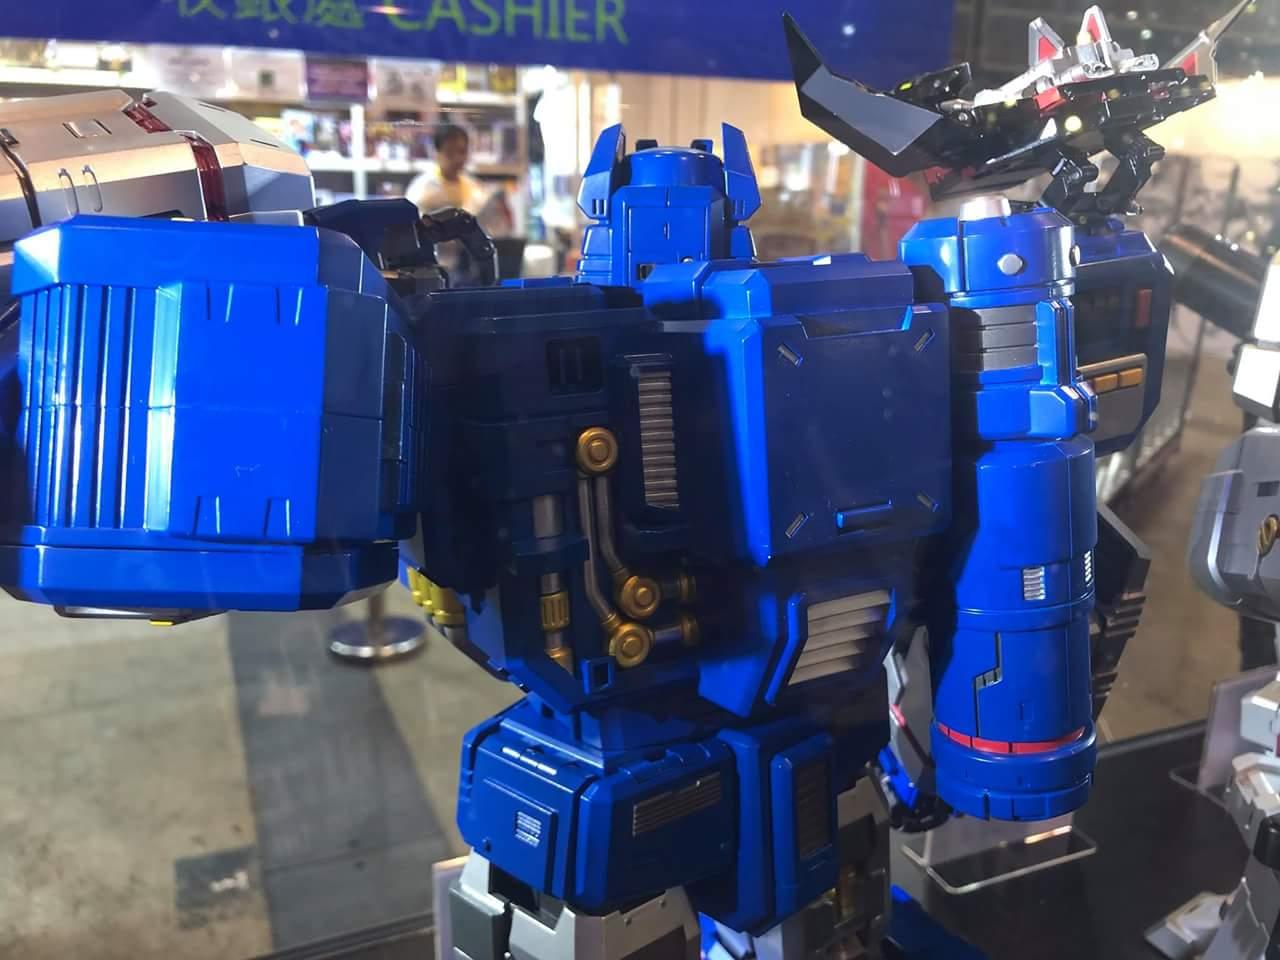 Figurines Transformers G1 (articulé, non transformable) ― Par 3A, Action Toys, Fewture, Toys Alliance, Sentinel, Kotobukiya, Kids Logic, Herocross, EX Gokin, etc - Page 6 Hl9BJUQo_o